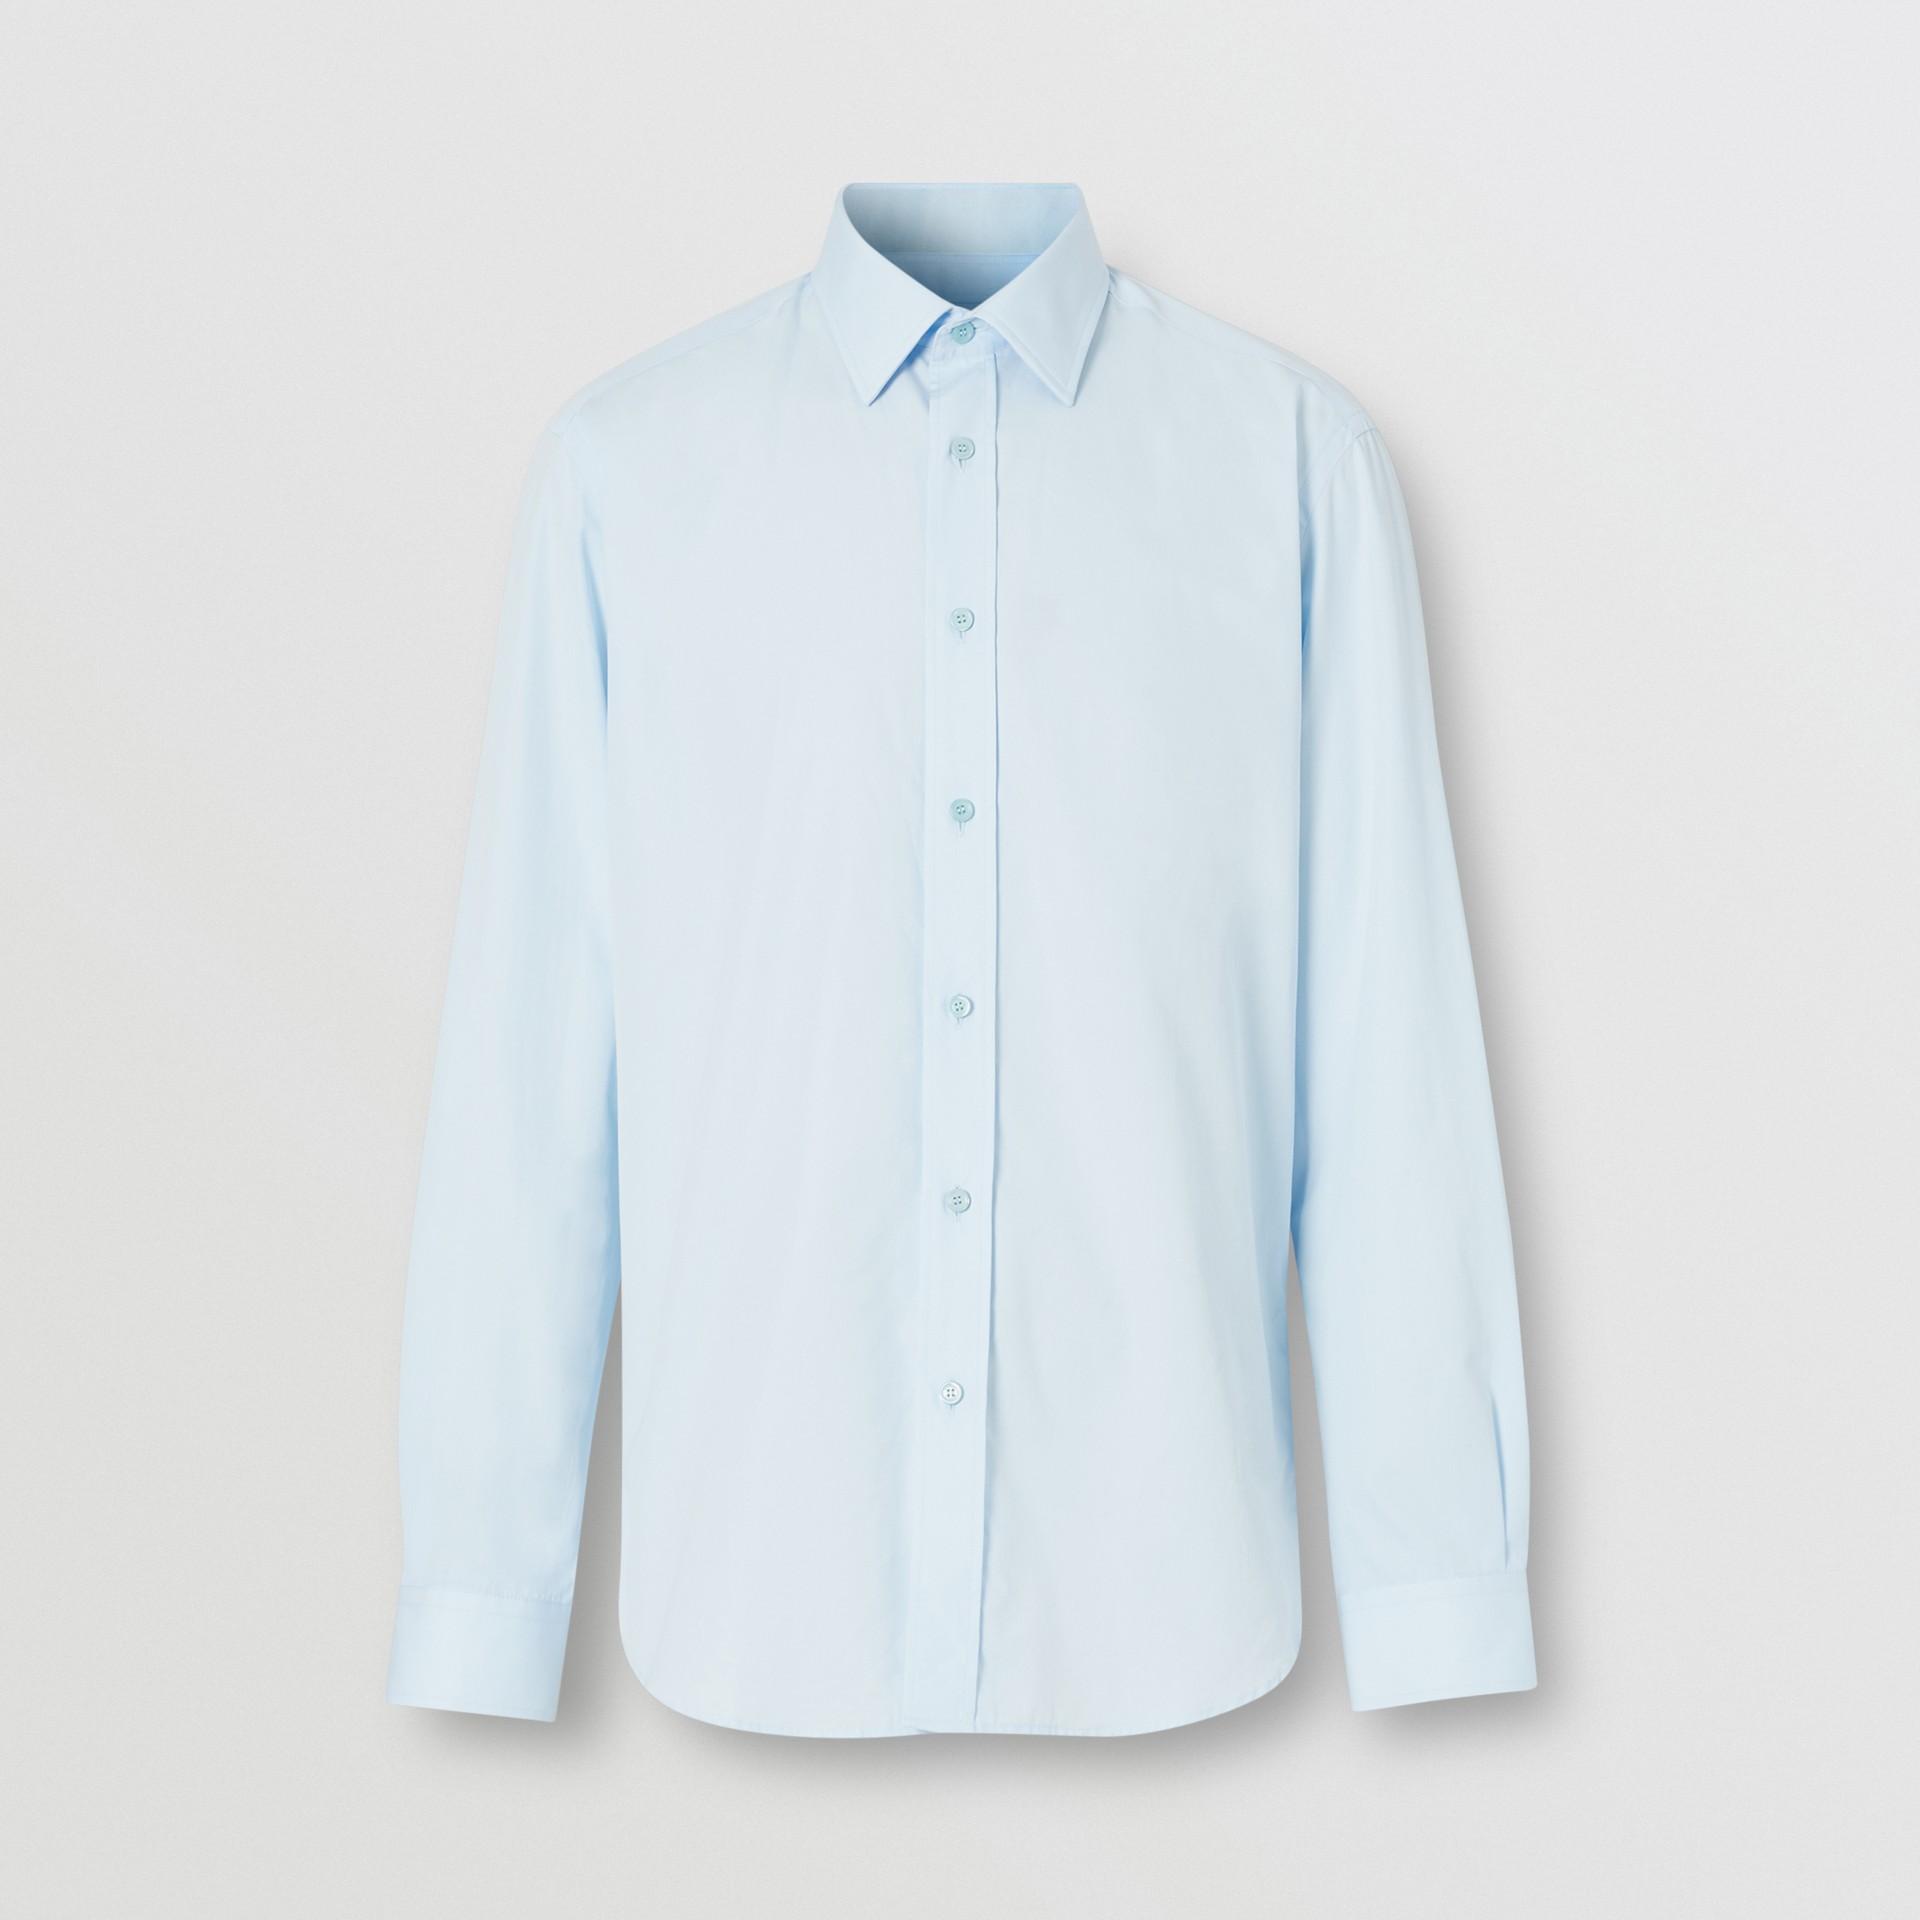 Classic Fit Monogram Motif Cotton Poplin Shirt in Pale Blue - Men | Burberry Singapore - gallery image 3